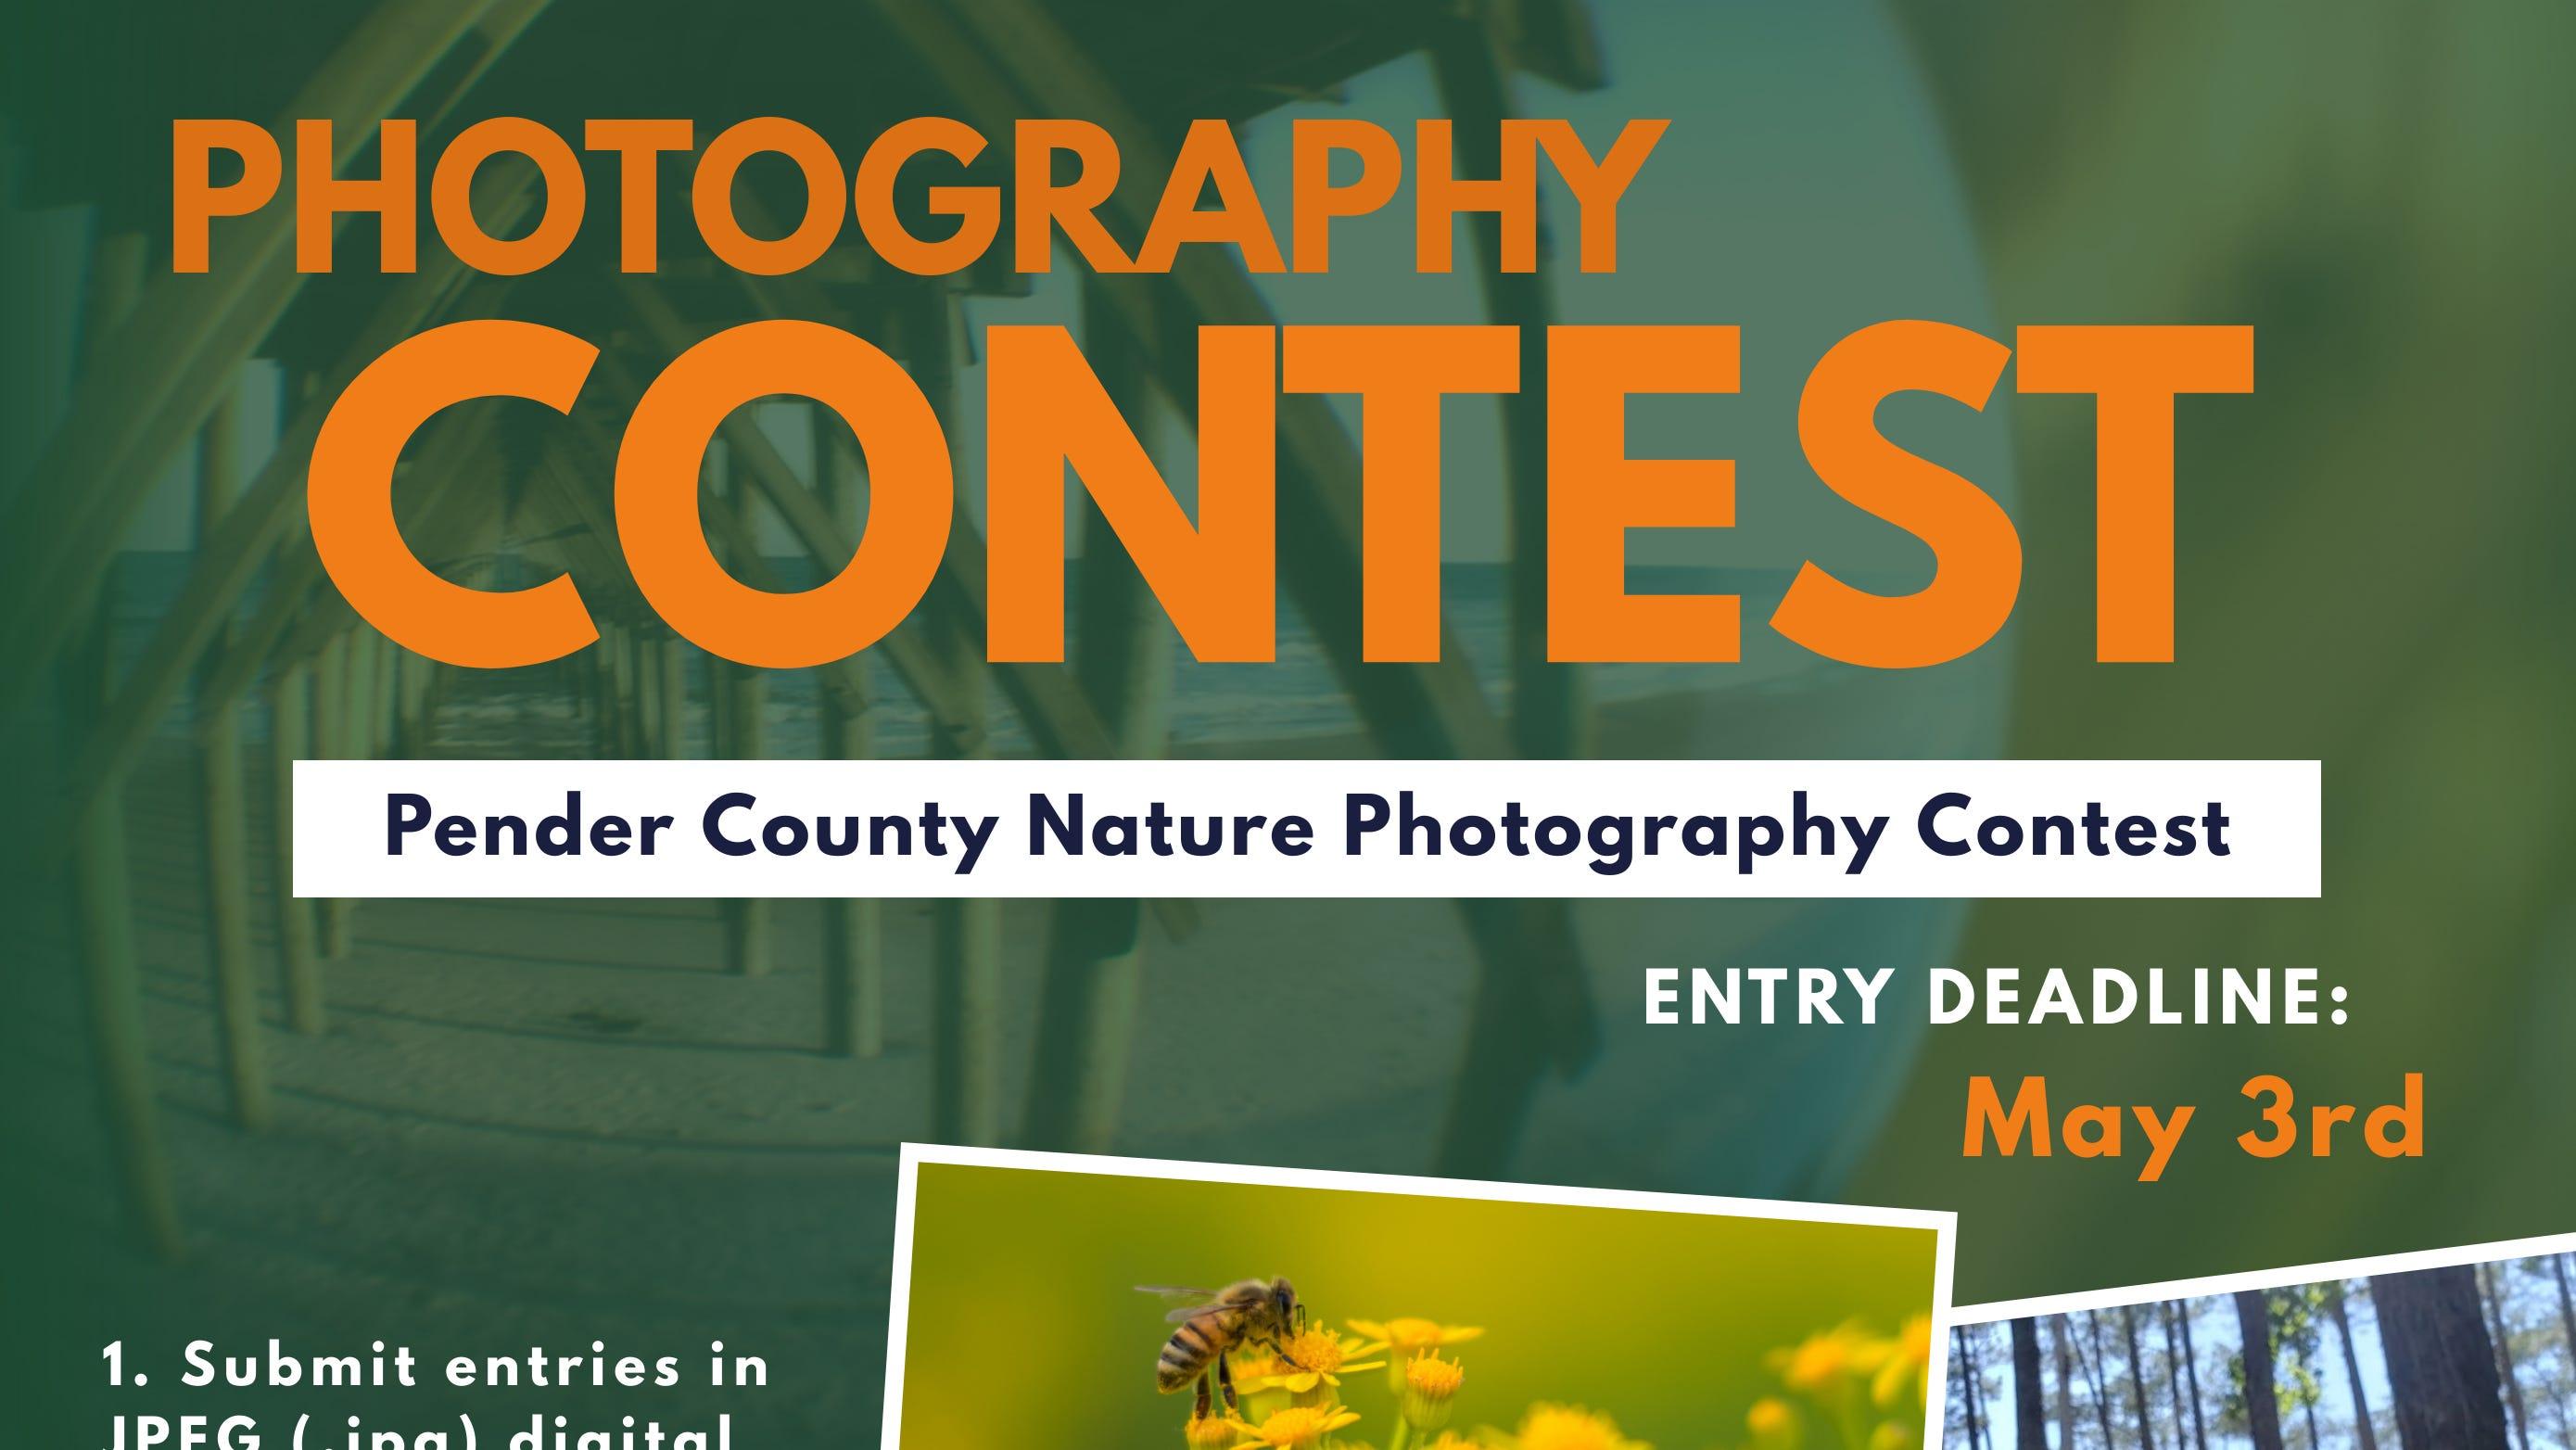 e0fb12ce 6a32 49c8 b775 cbb477b69cd6 2021 Nature Photography Contest jpg?crop=2779,1564,x0,y0&width=2779&height=1564&format=pjpg&auto=webp.